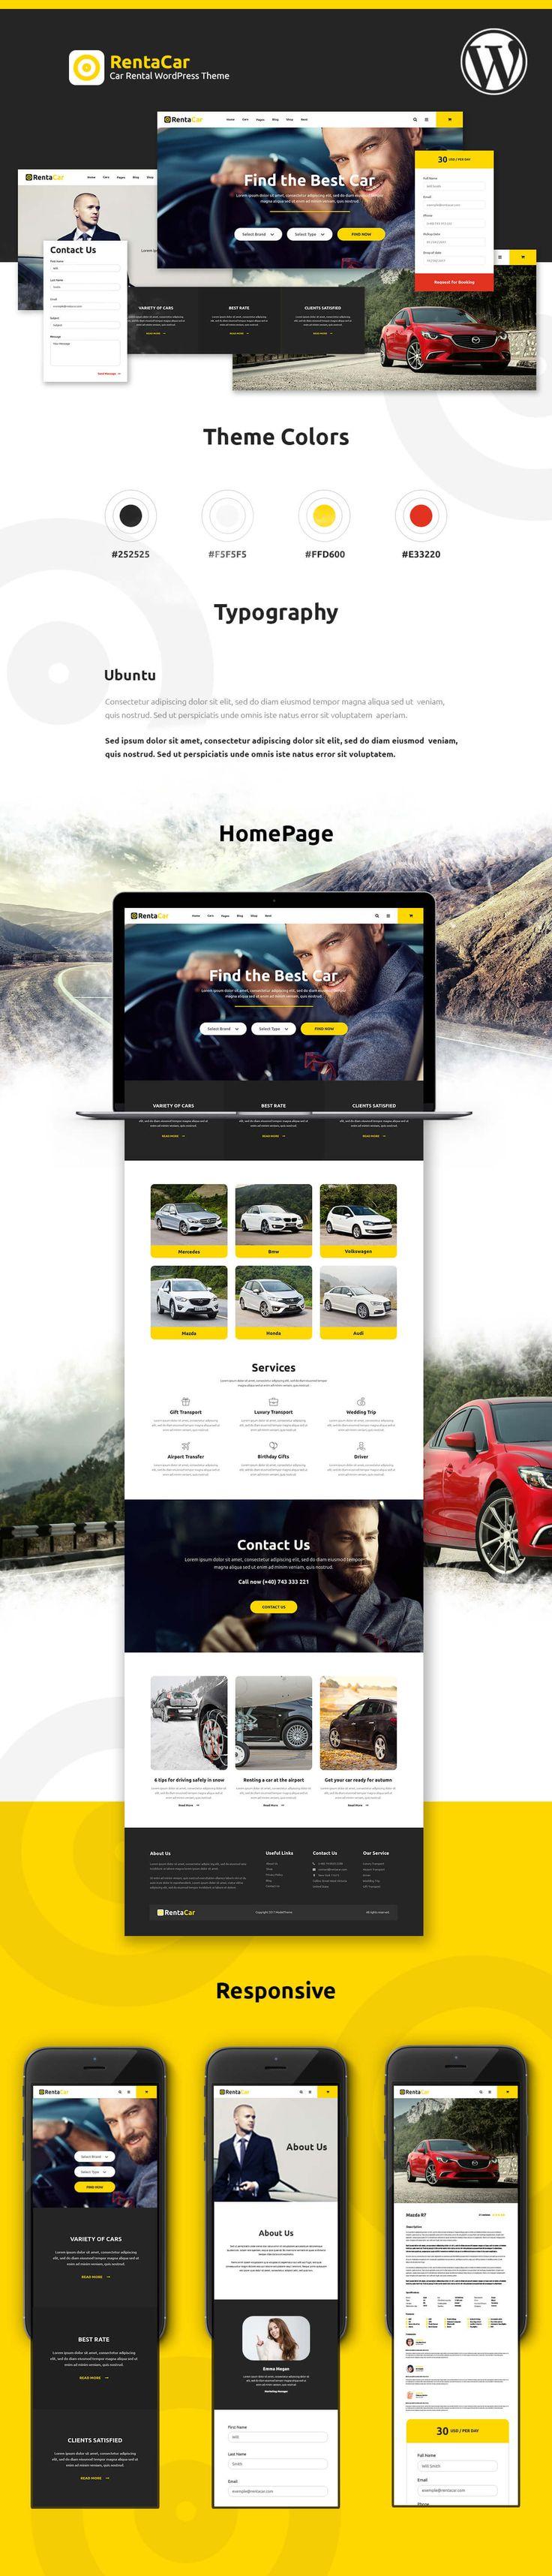 Rentacar - Car Rental / Listing WordPress Theme by modeltheme | ThemeForest